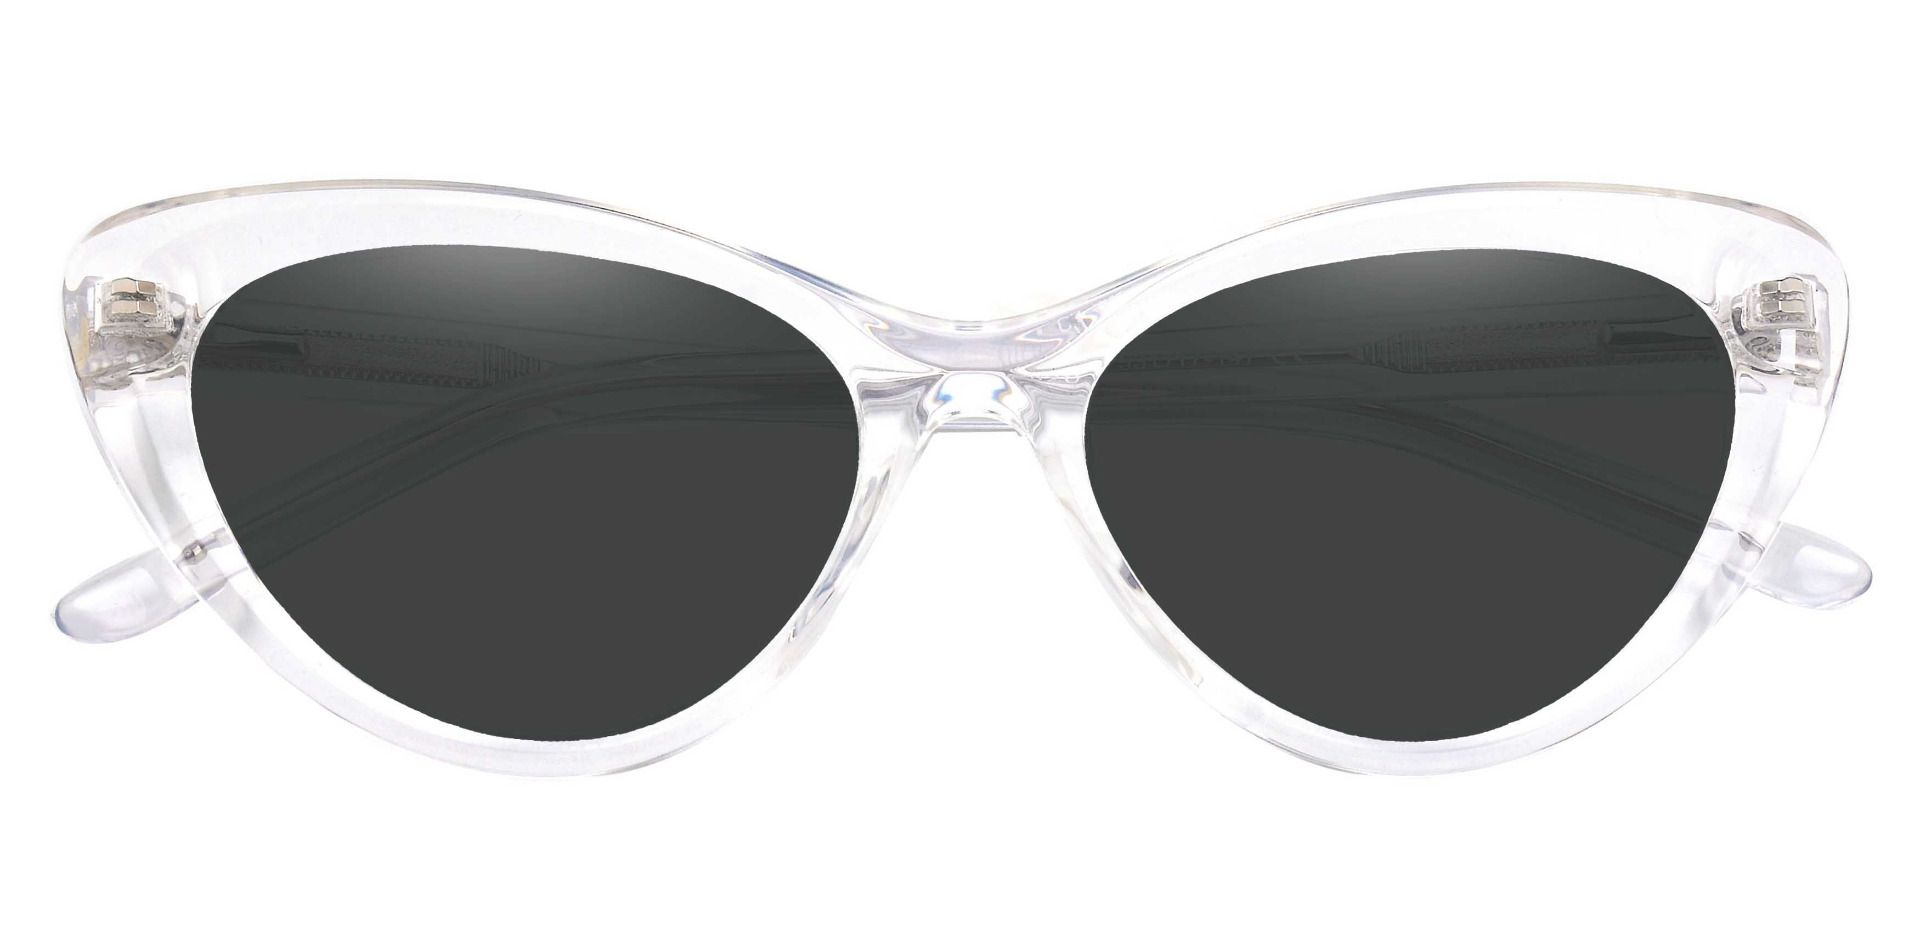 Gemini Cat Eye Prescription Sunglasses - Clear Frame With Gray Lenses